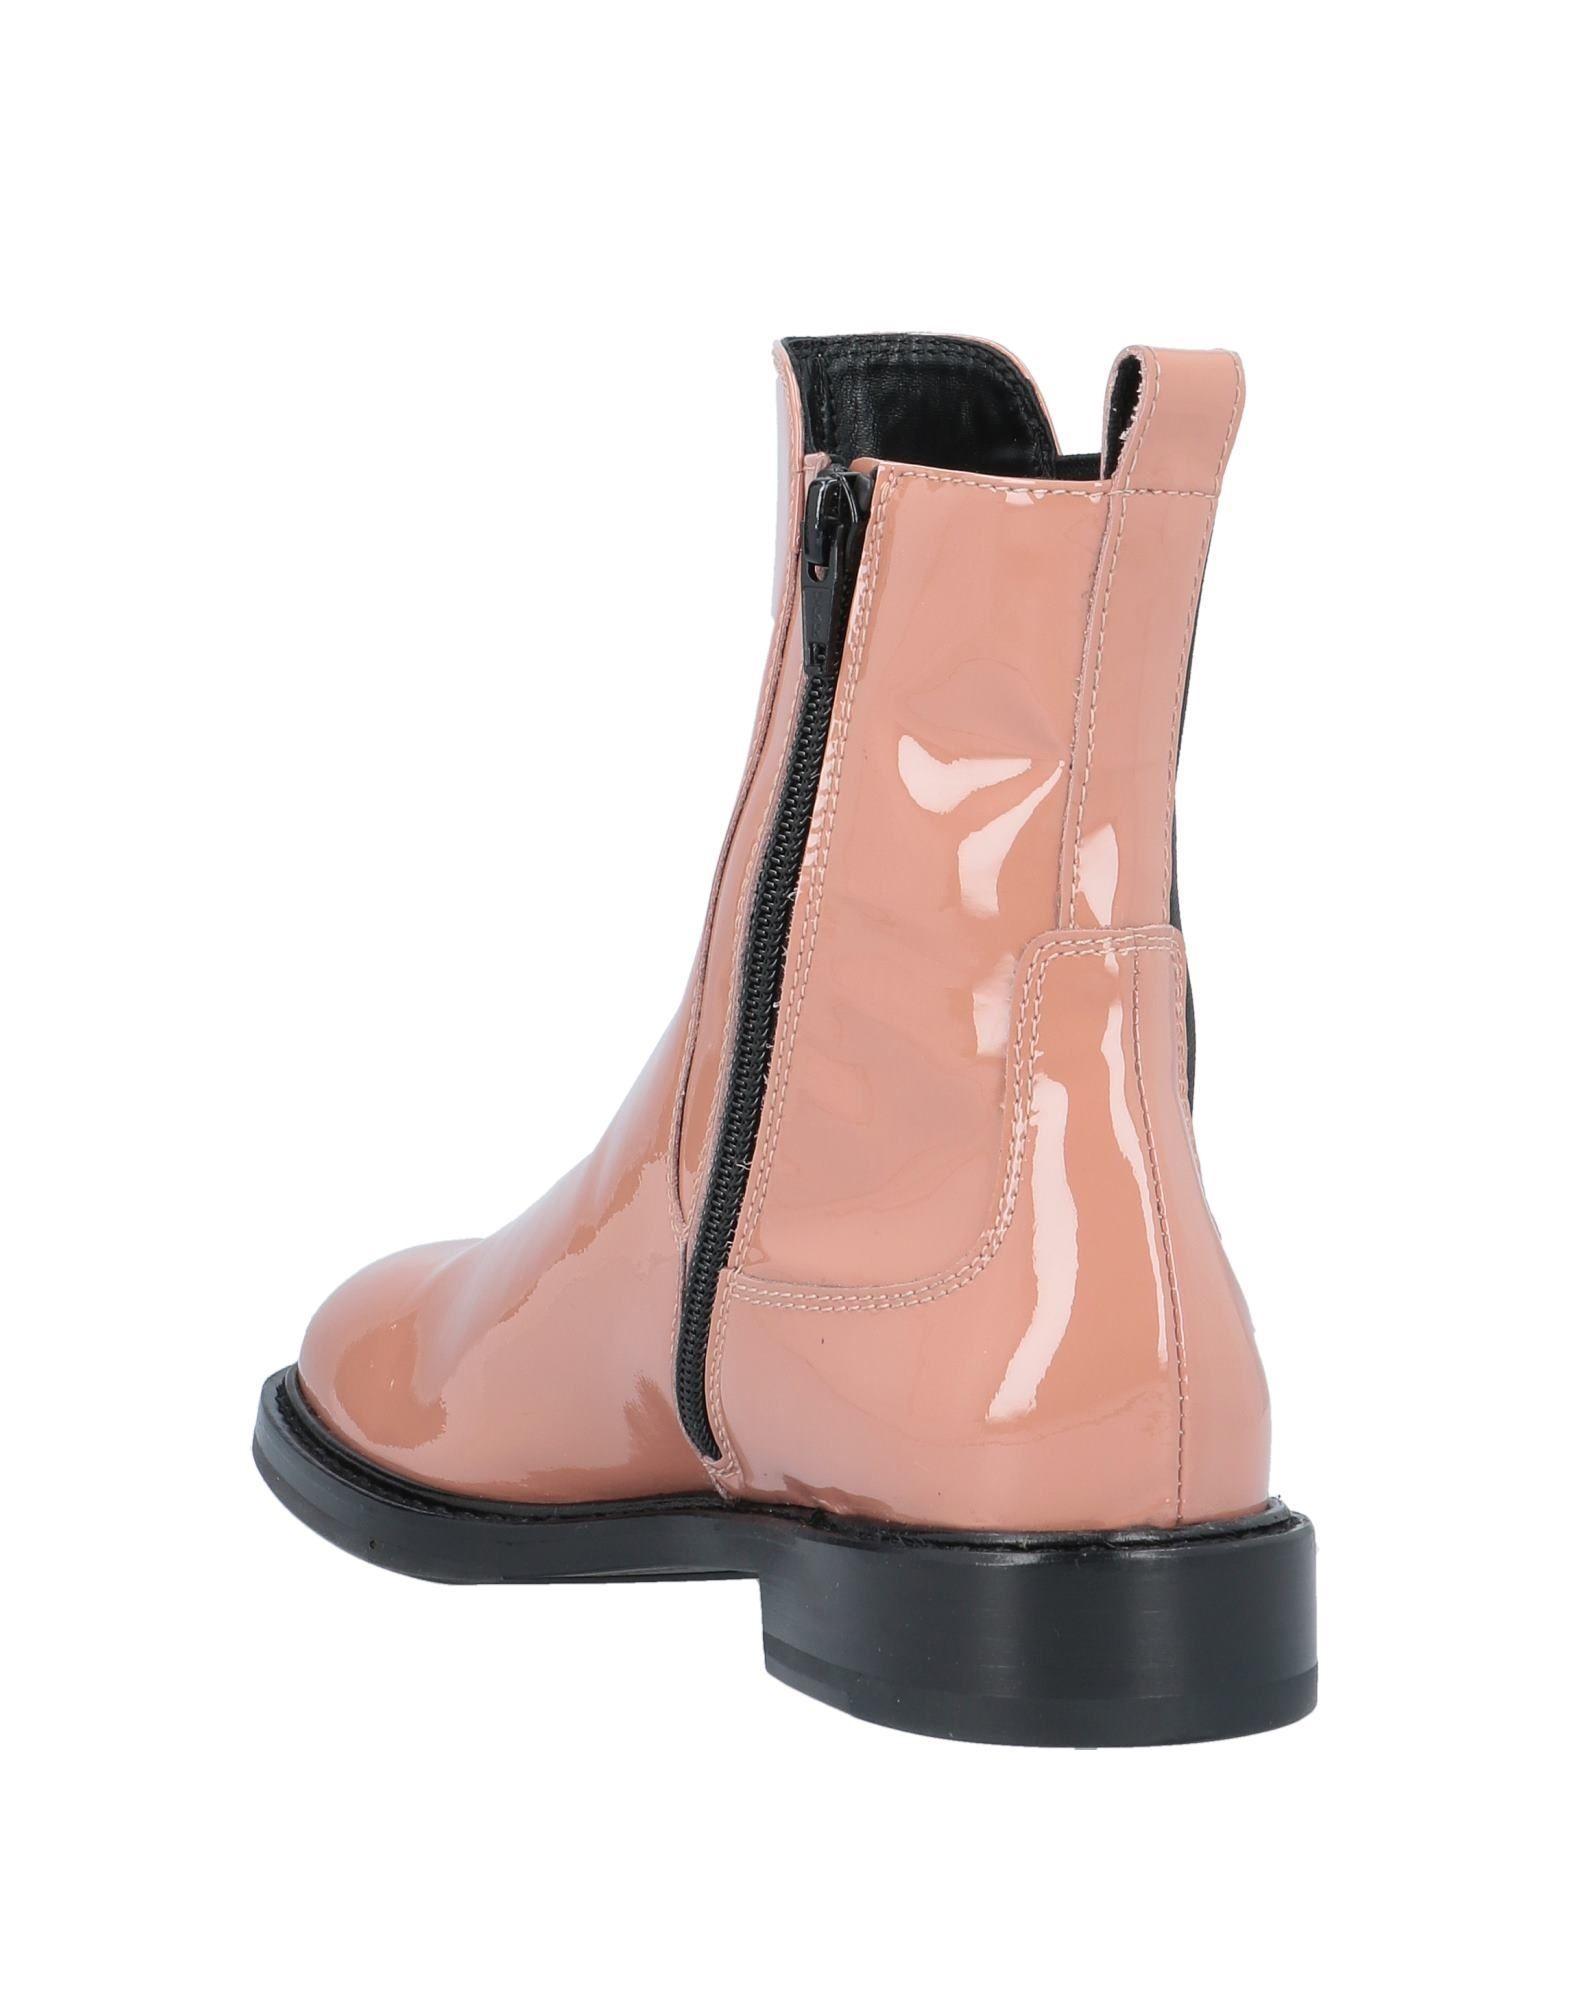 Botines de caña alta Agl Attilio Giusti Leombruni de Cuero de color Rosa